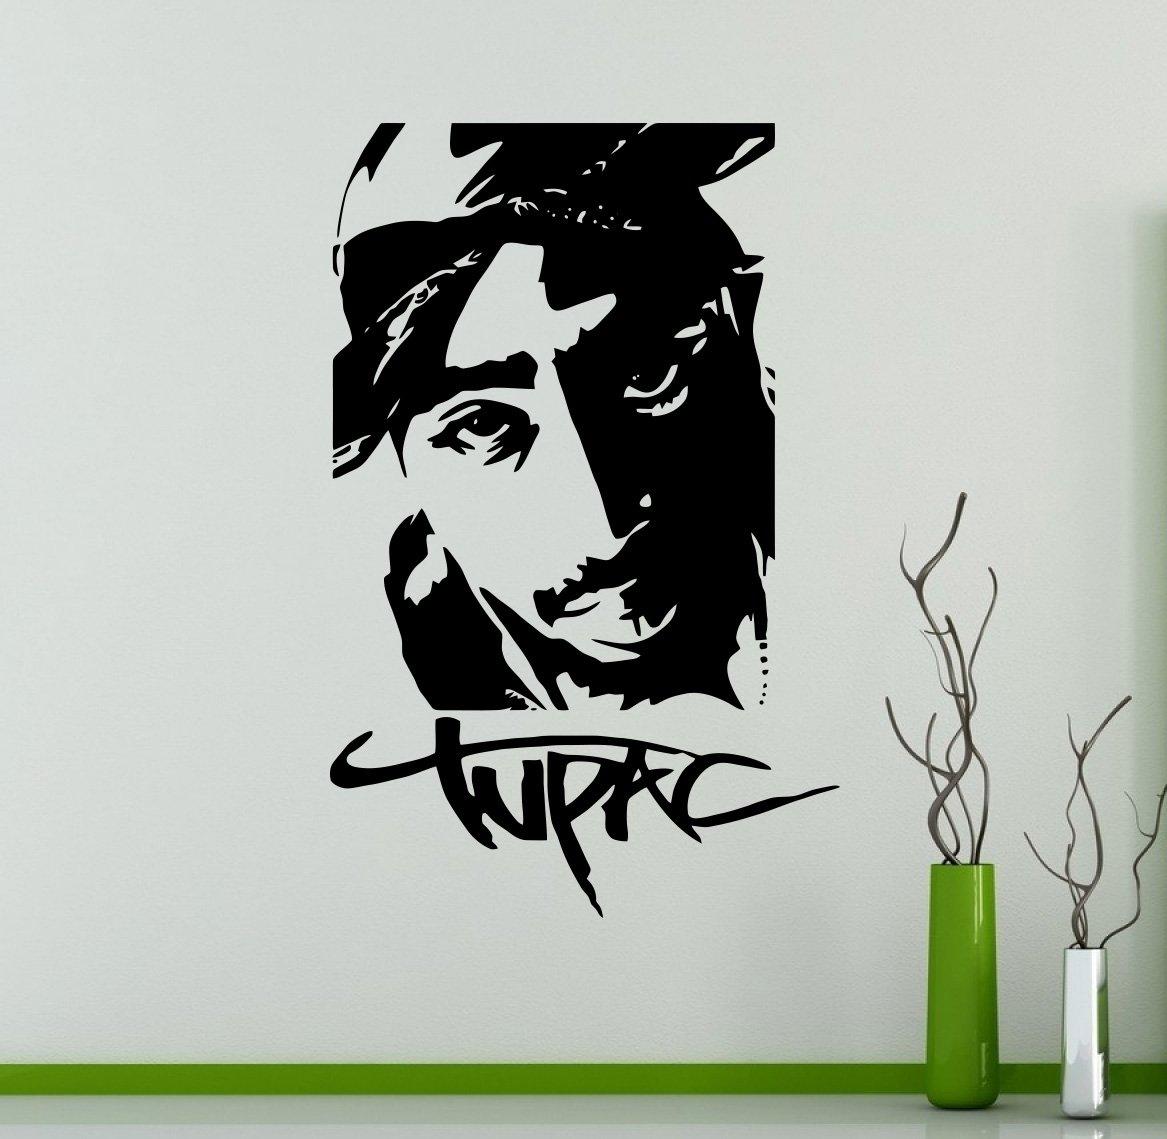 2pac wall decal tupac amaru shakur wall vinyl sticker rapper hip 2pac wall decal tupac amaru shakur wall vinyl sticker rapper hip hop home interior bedroom decor wall design 9 tpc amazon com